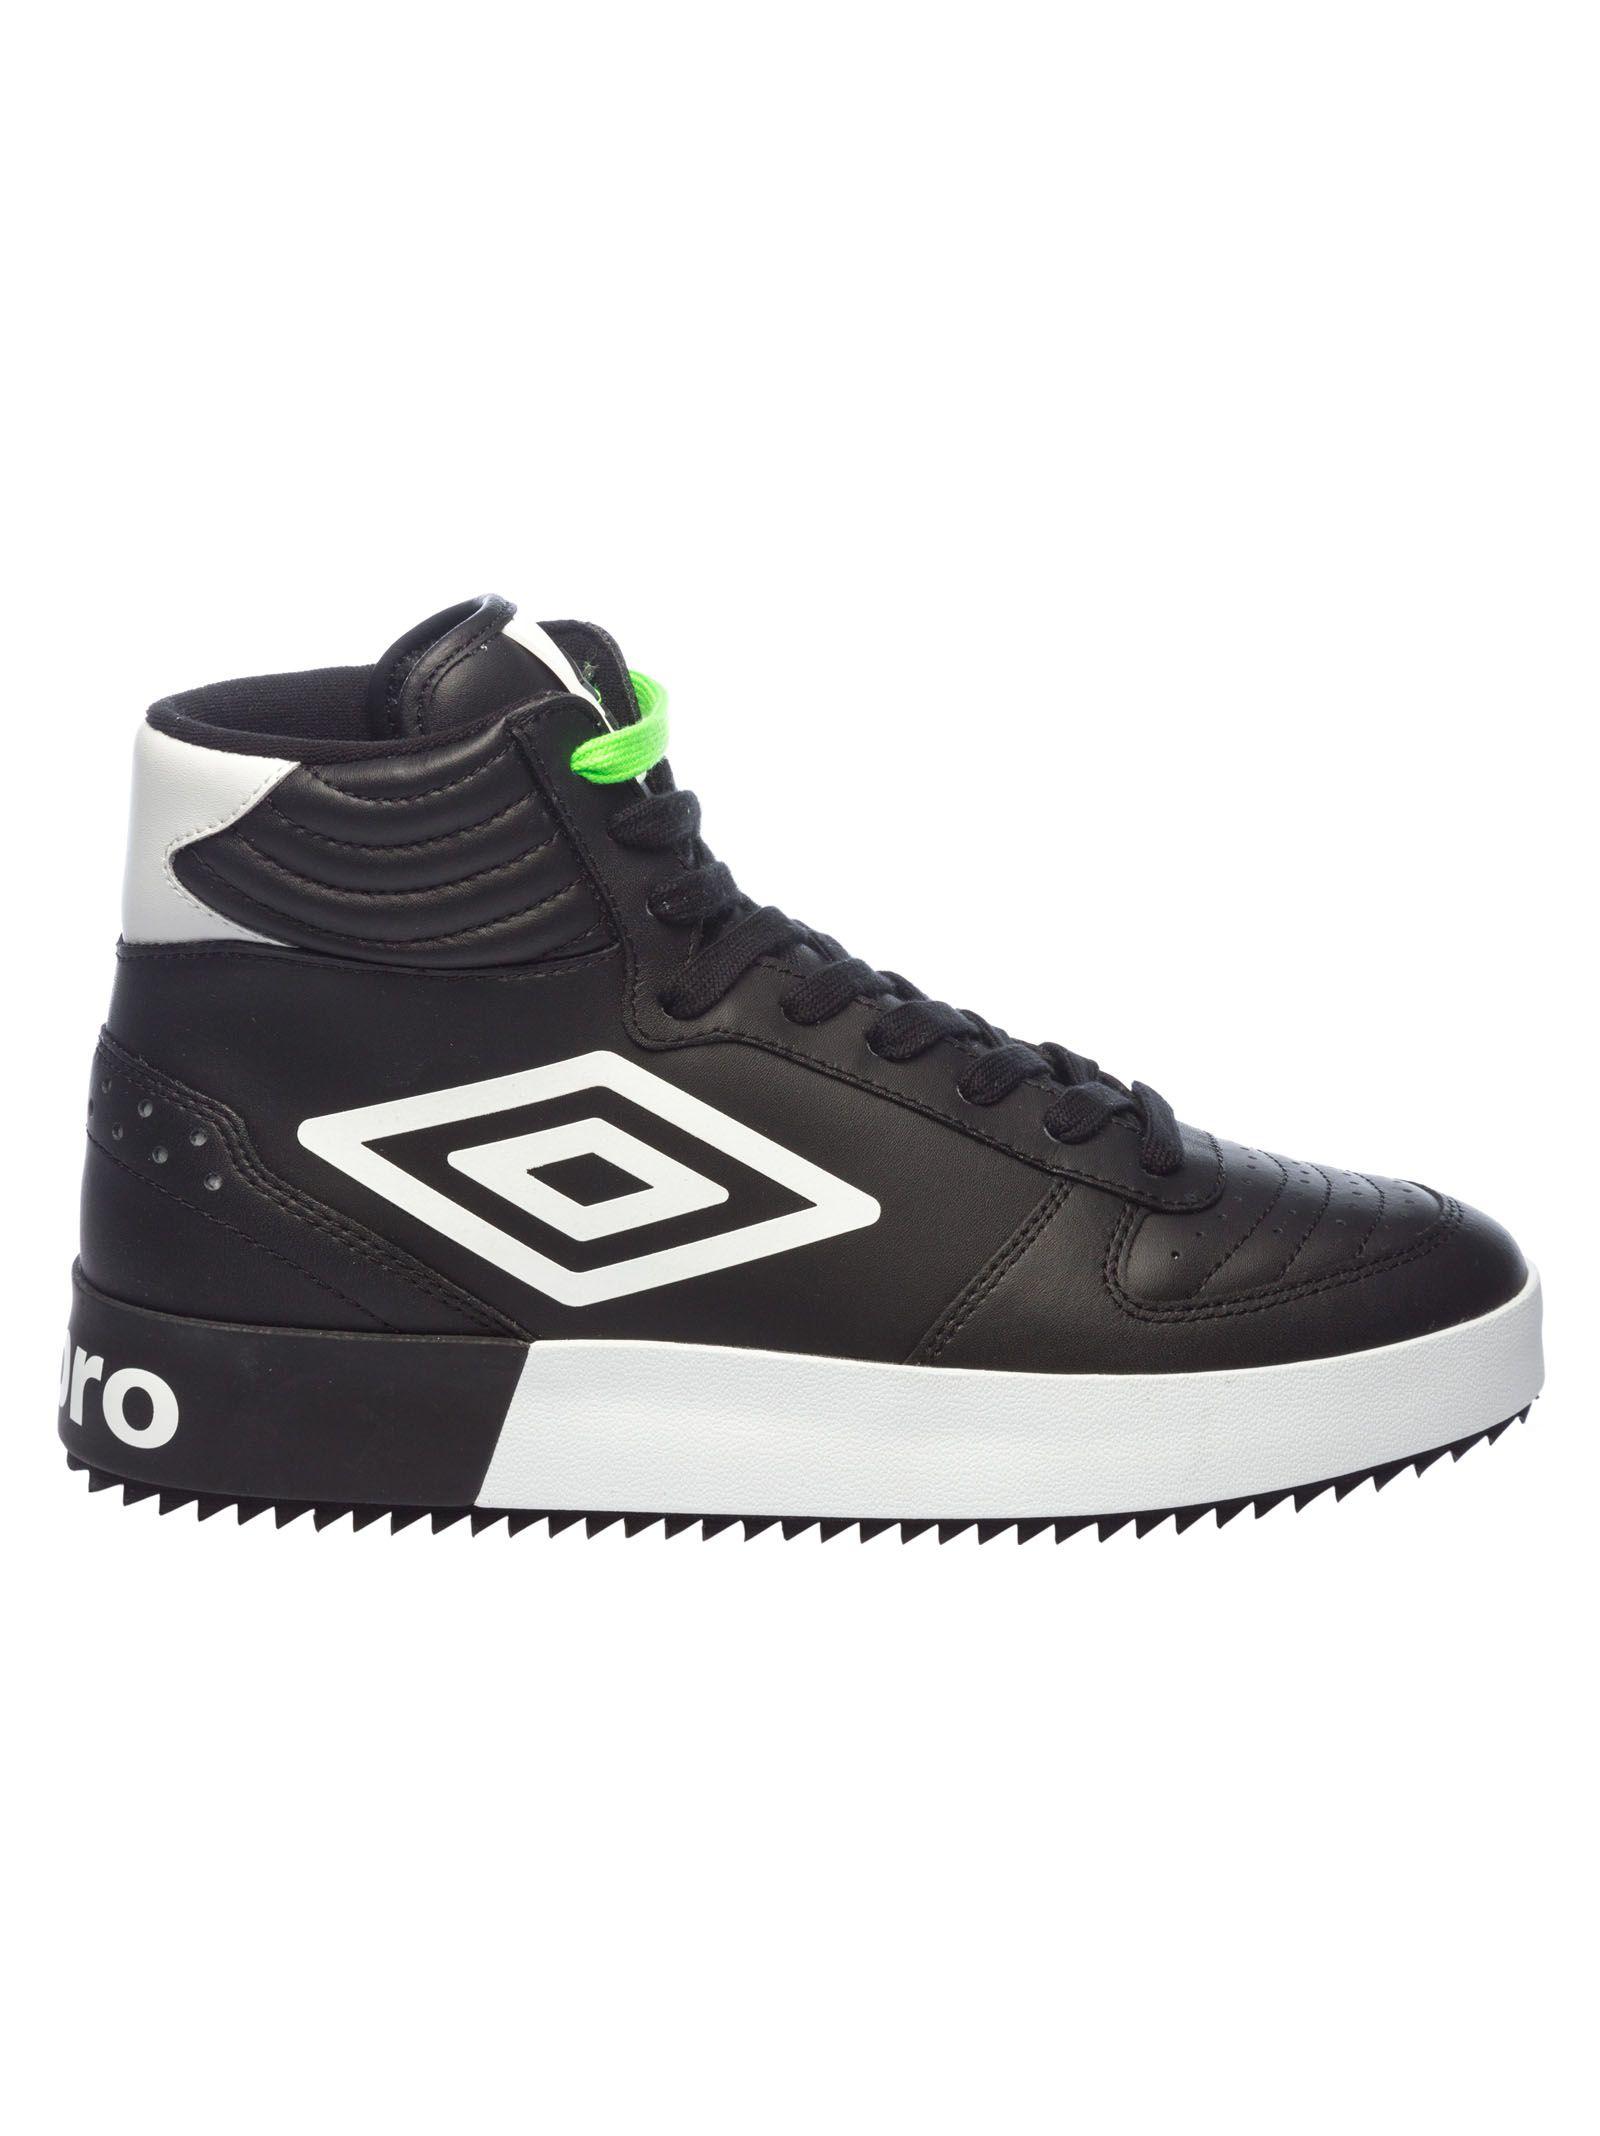 UMBRO Hi-Top Logo Sneakers in Black